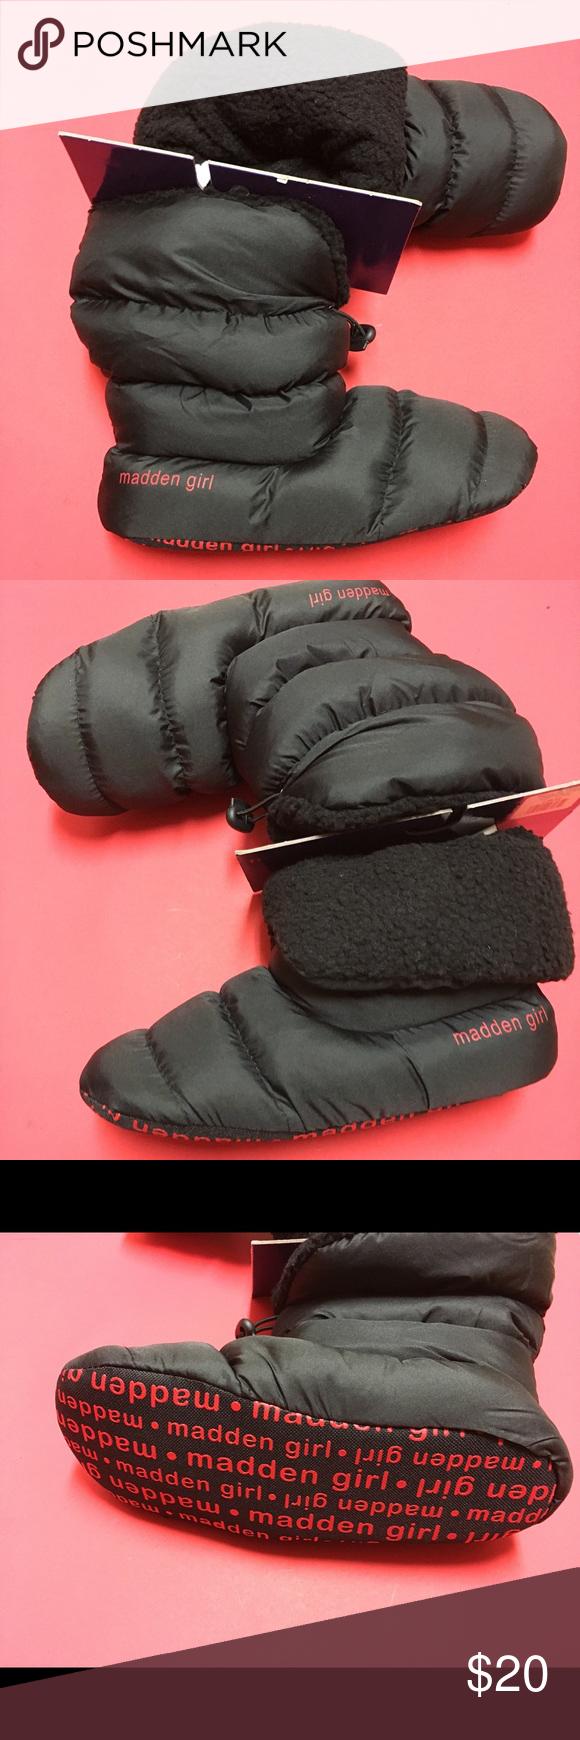 ✨NWT✨madden girl puffer slippers